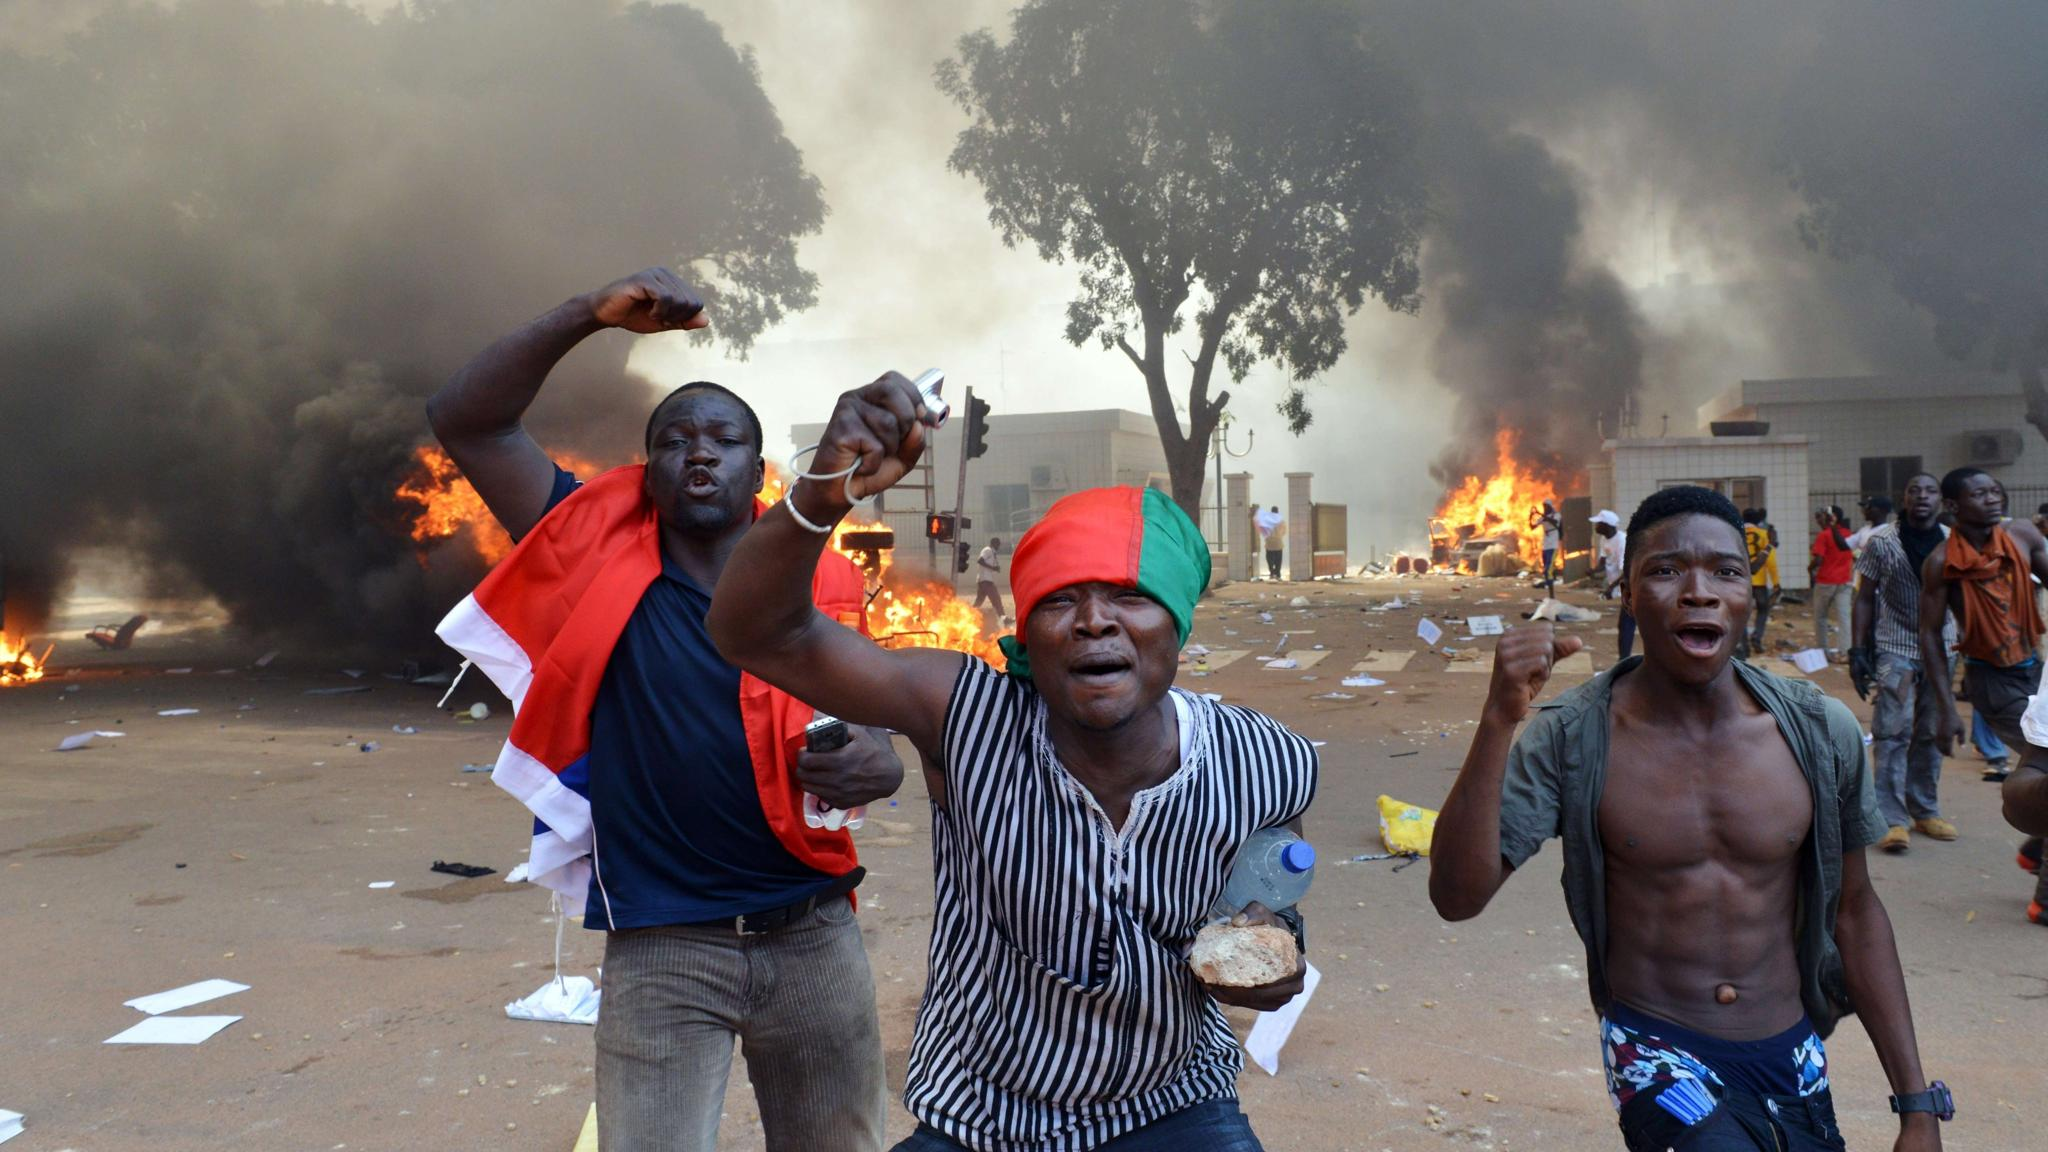 Military seizes power in Burkina Faso   Financial Times